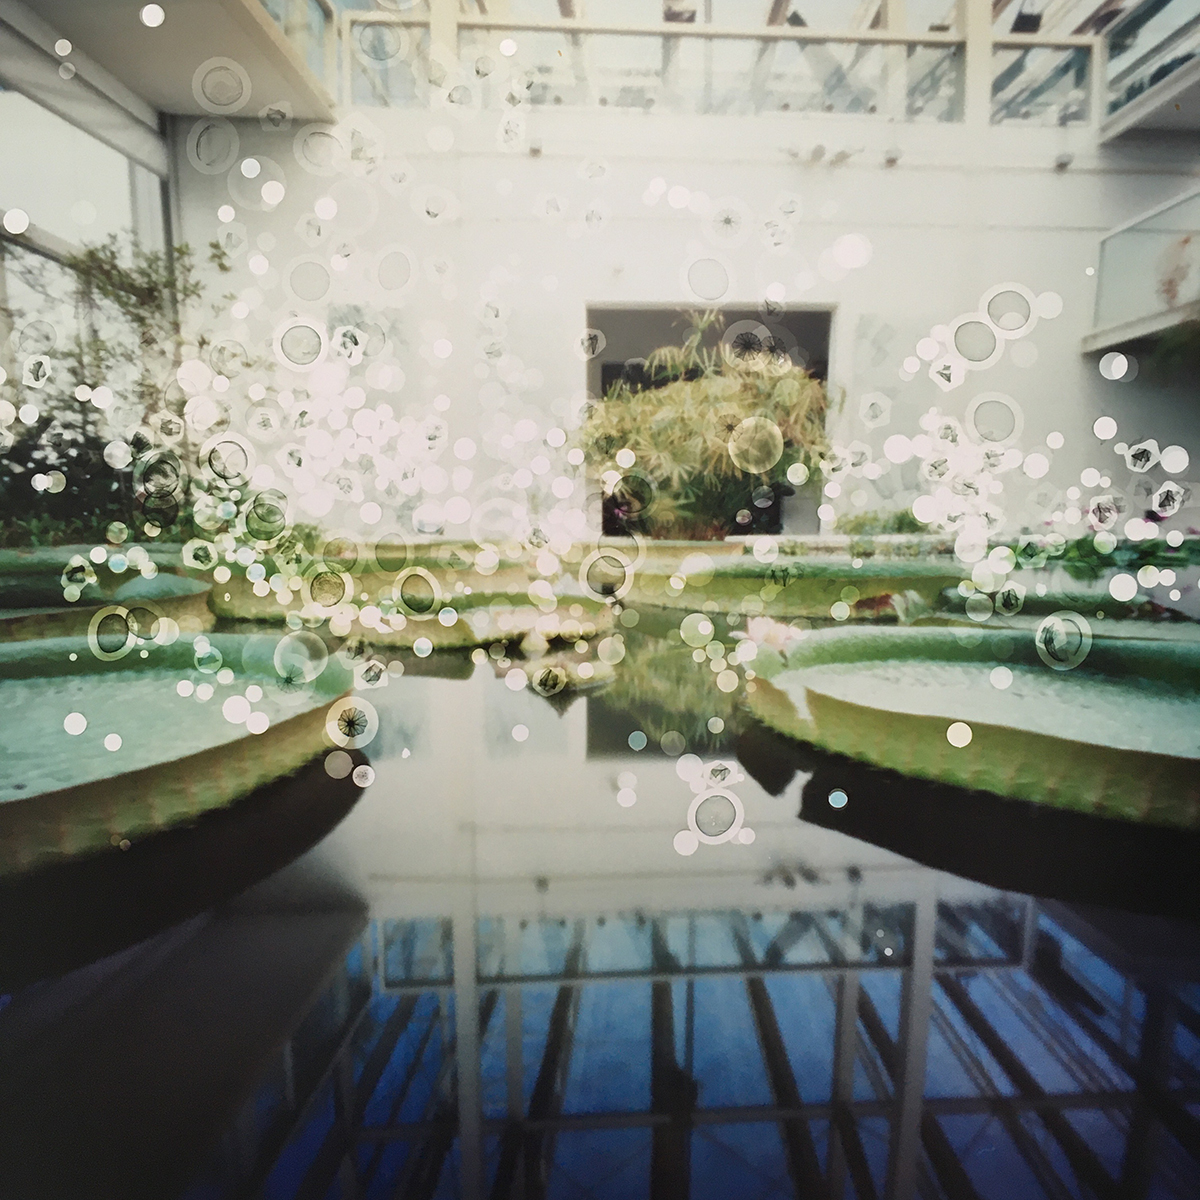 Biodiversity Garden, Padua, Italy (victoria lily pond) (2019)